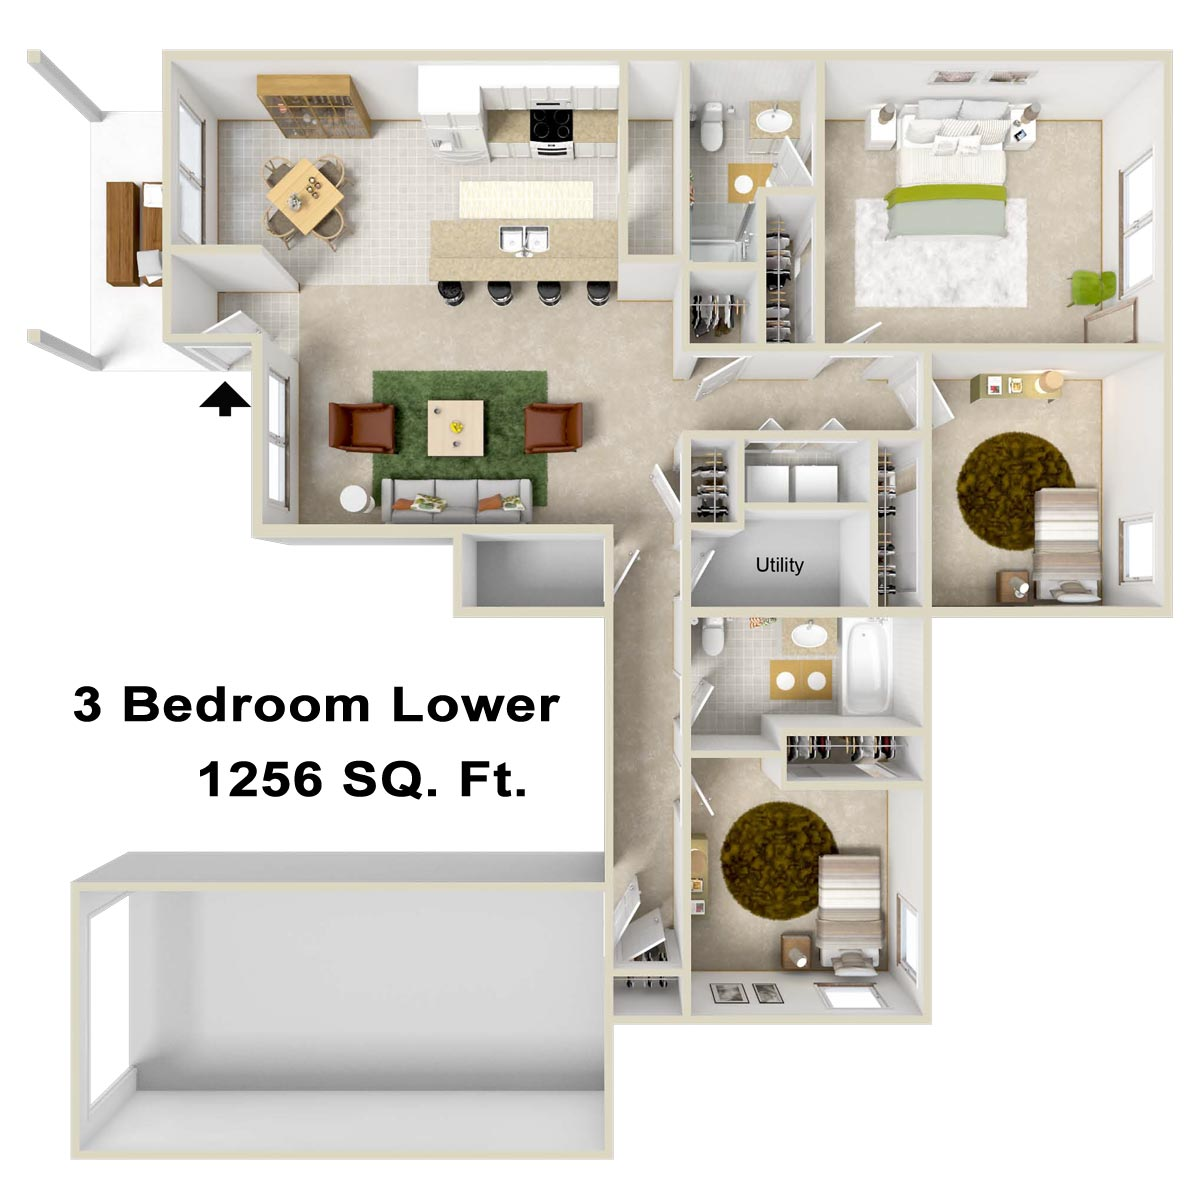 Autumn Wood Apartments: Apartment Rental Rates & Floorplans